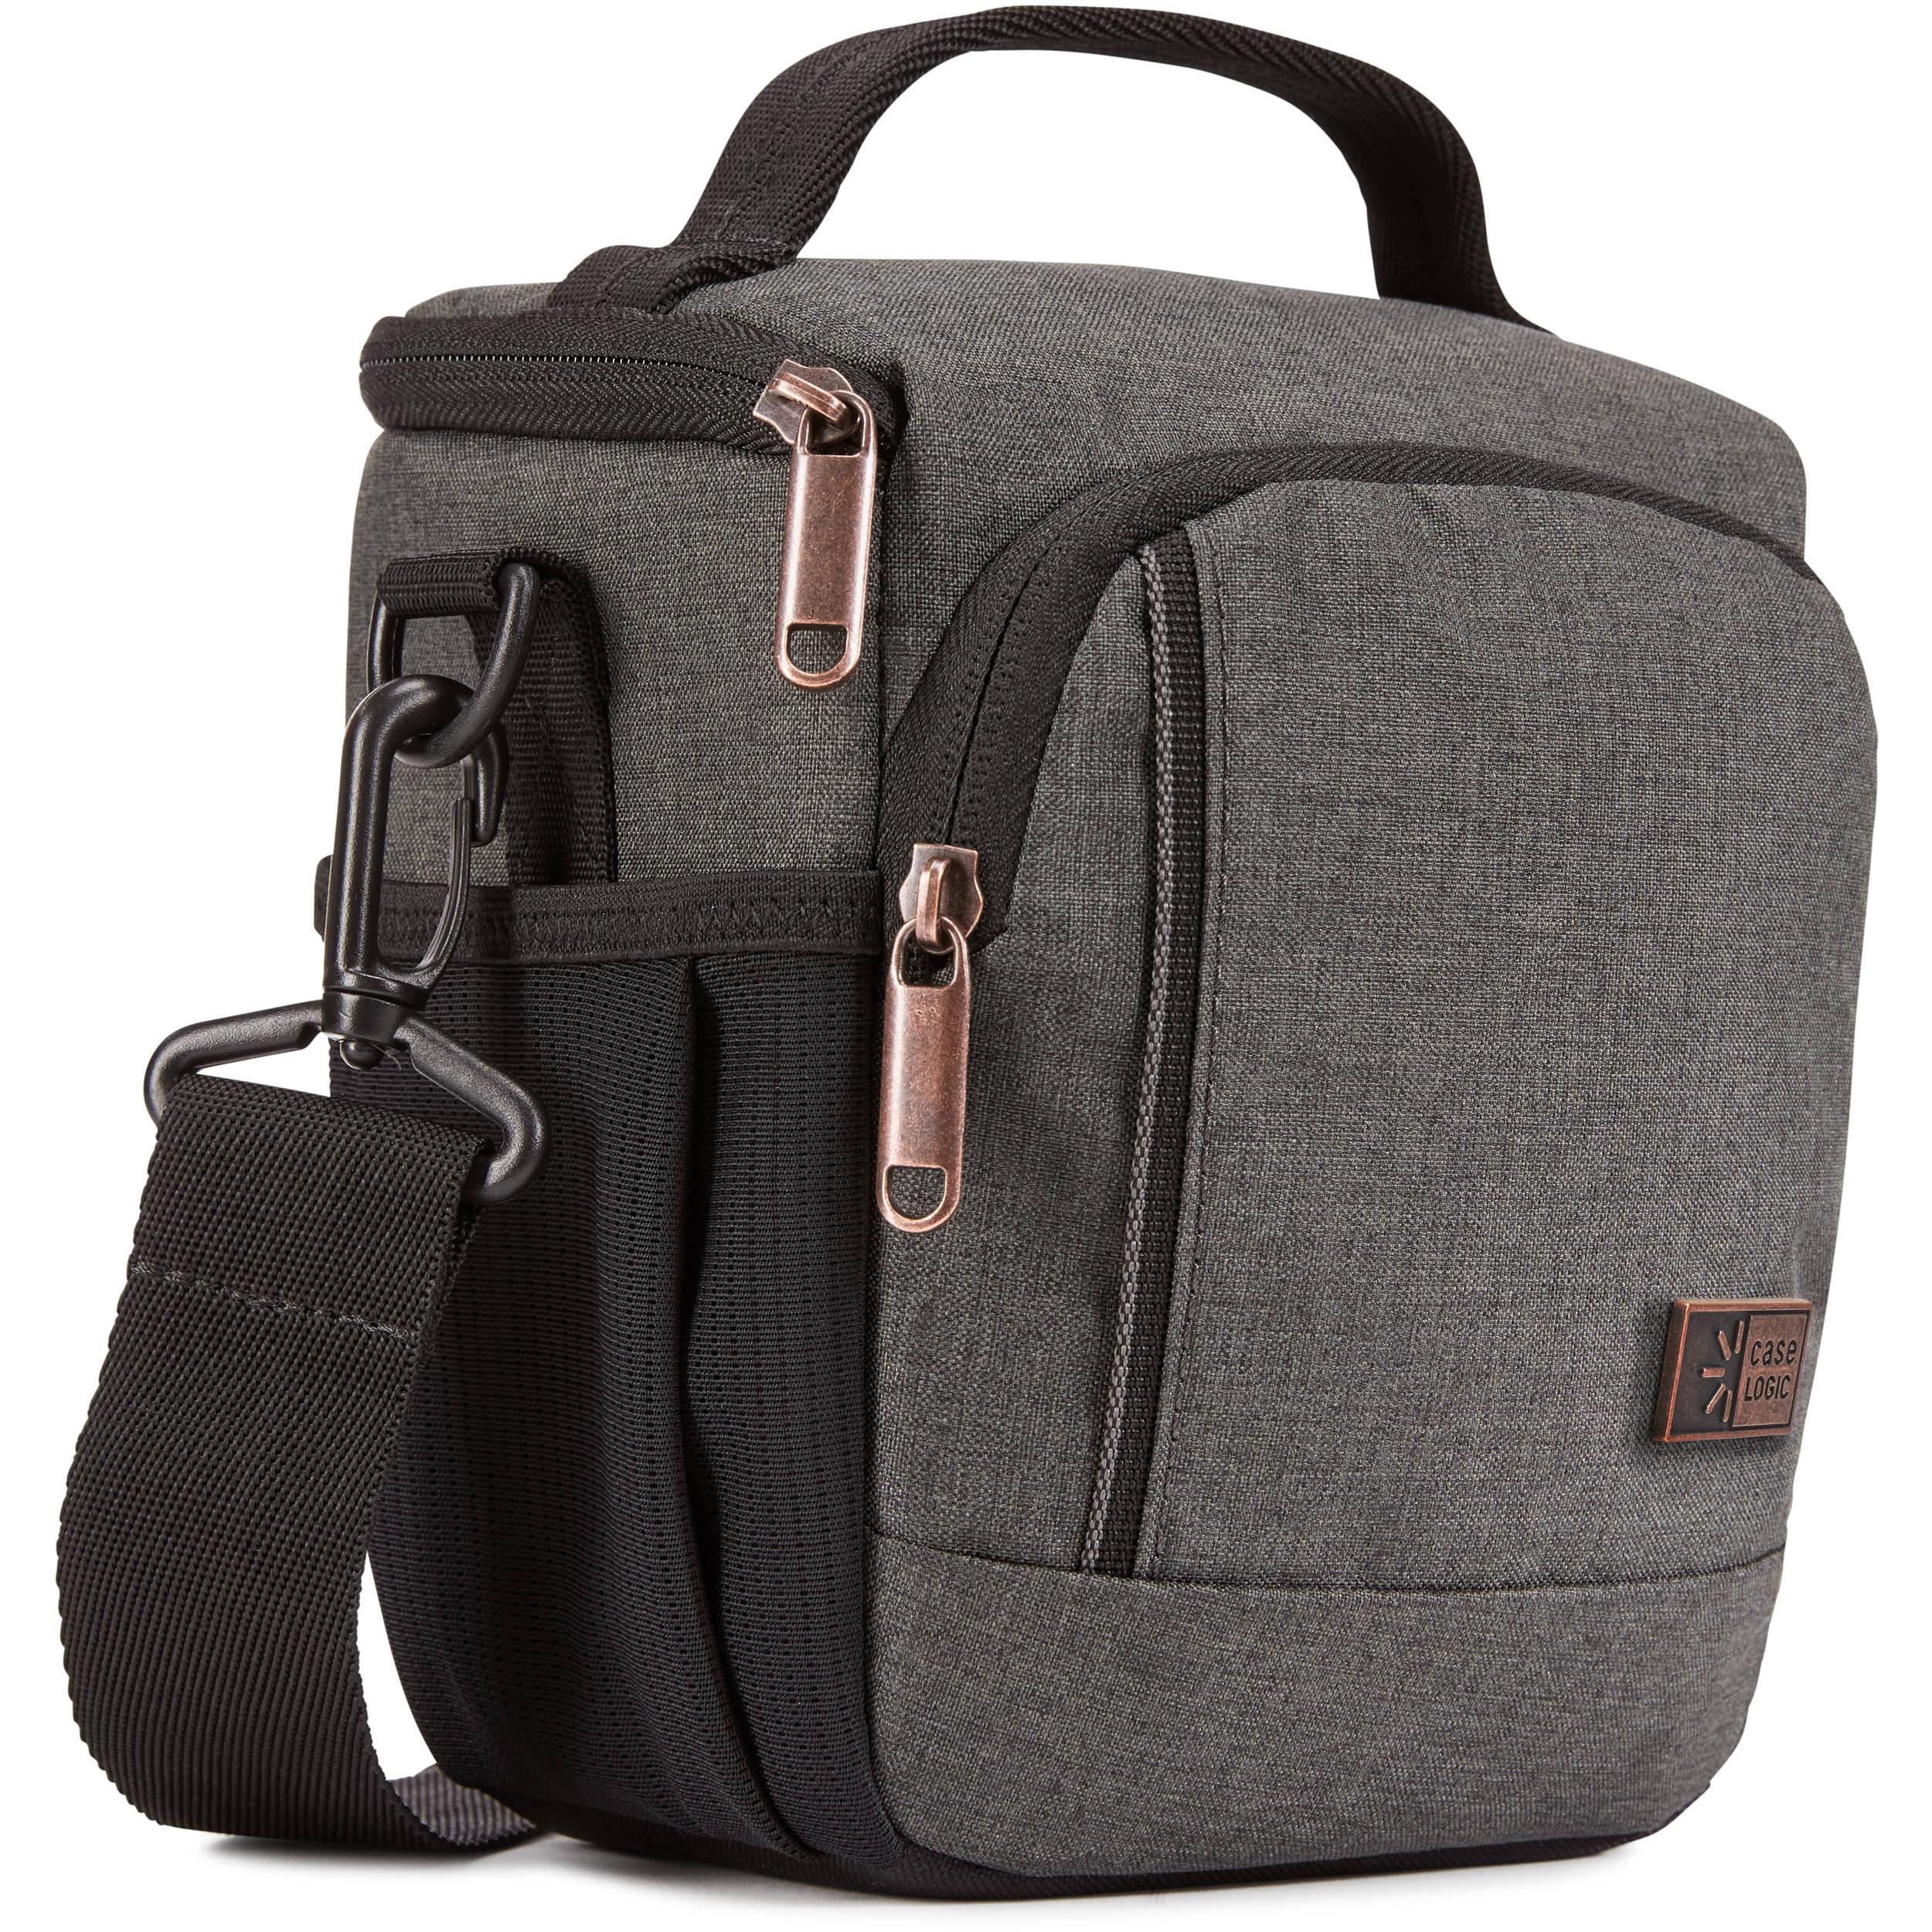 Case Logic Era Dslr Mirrorless Camera Bag Gray Small